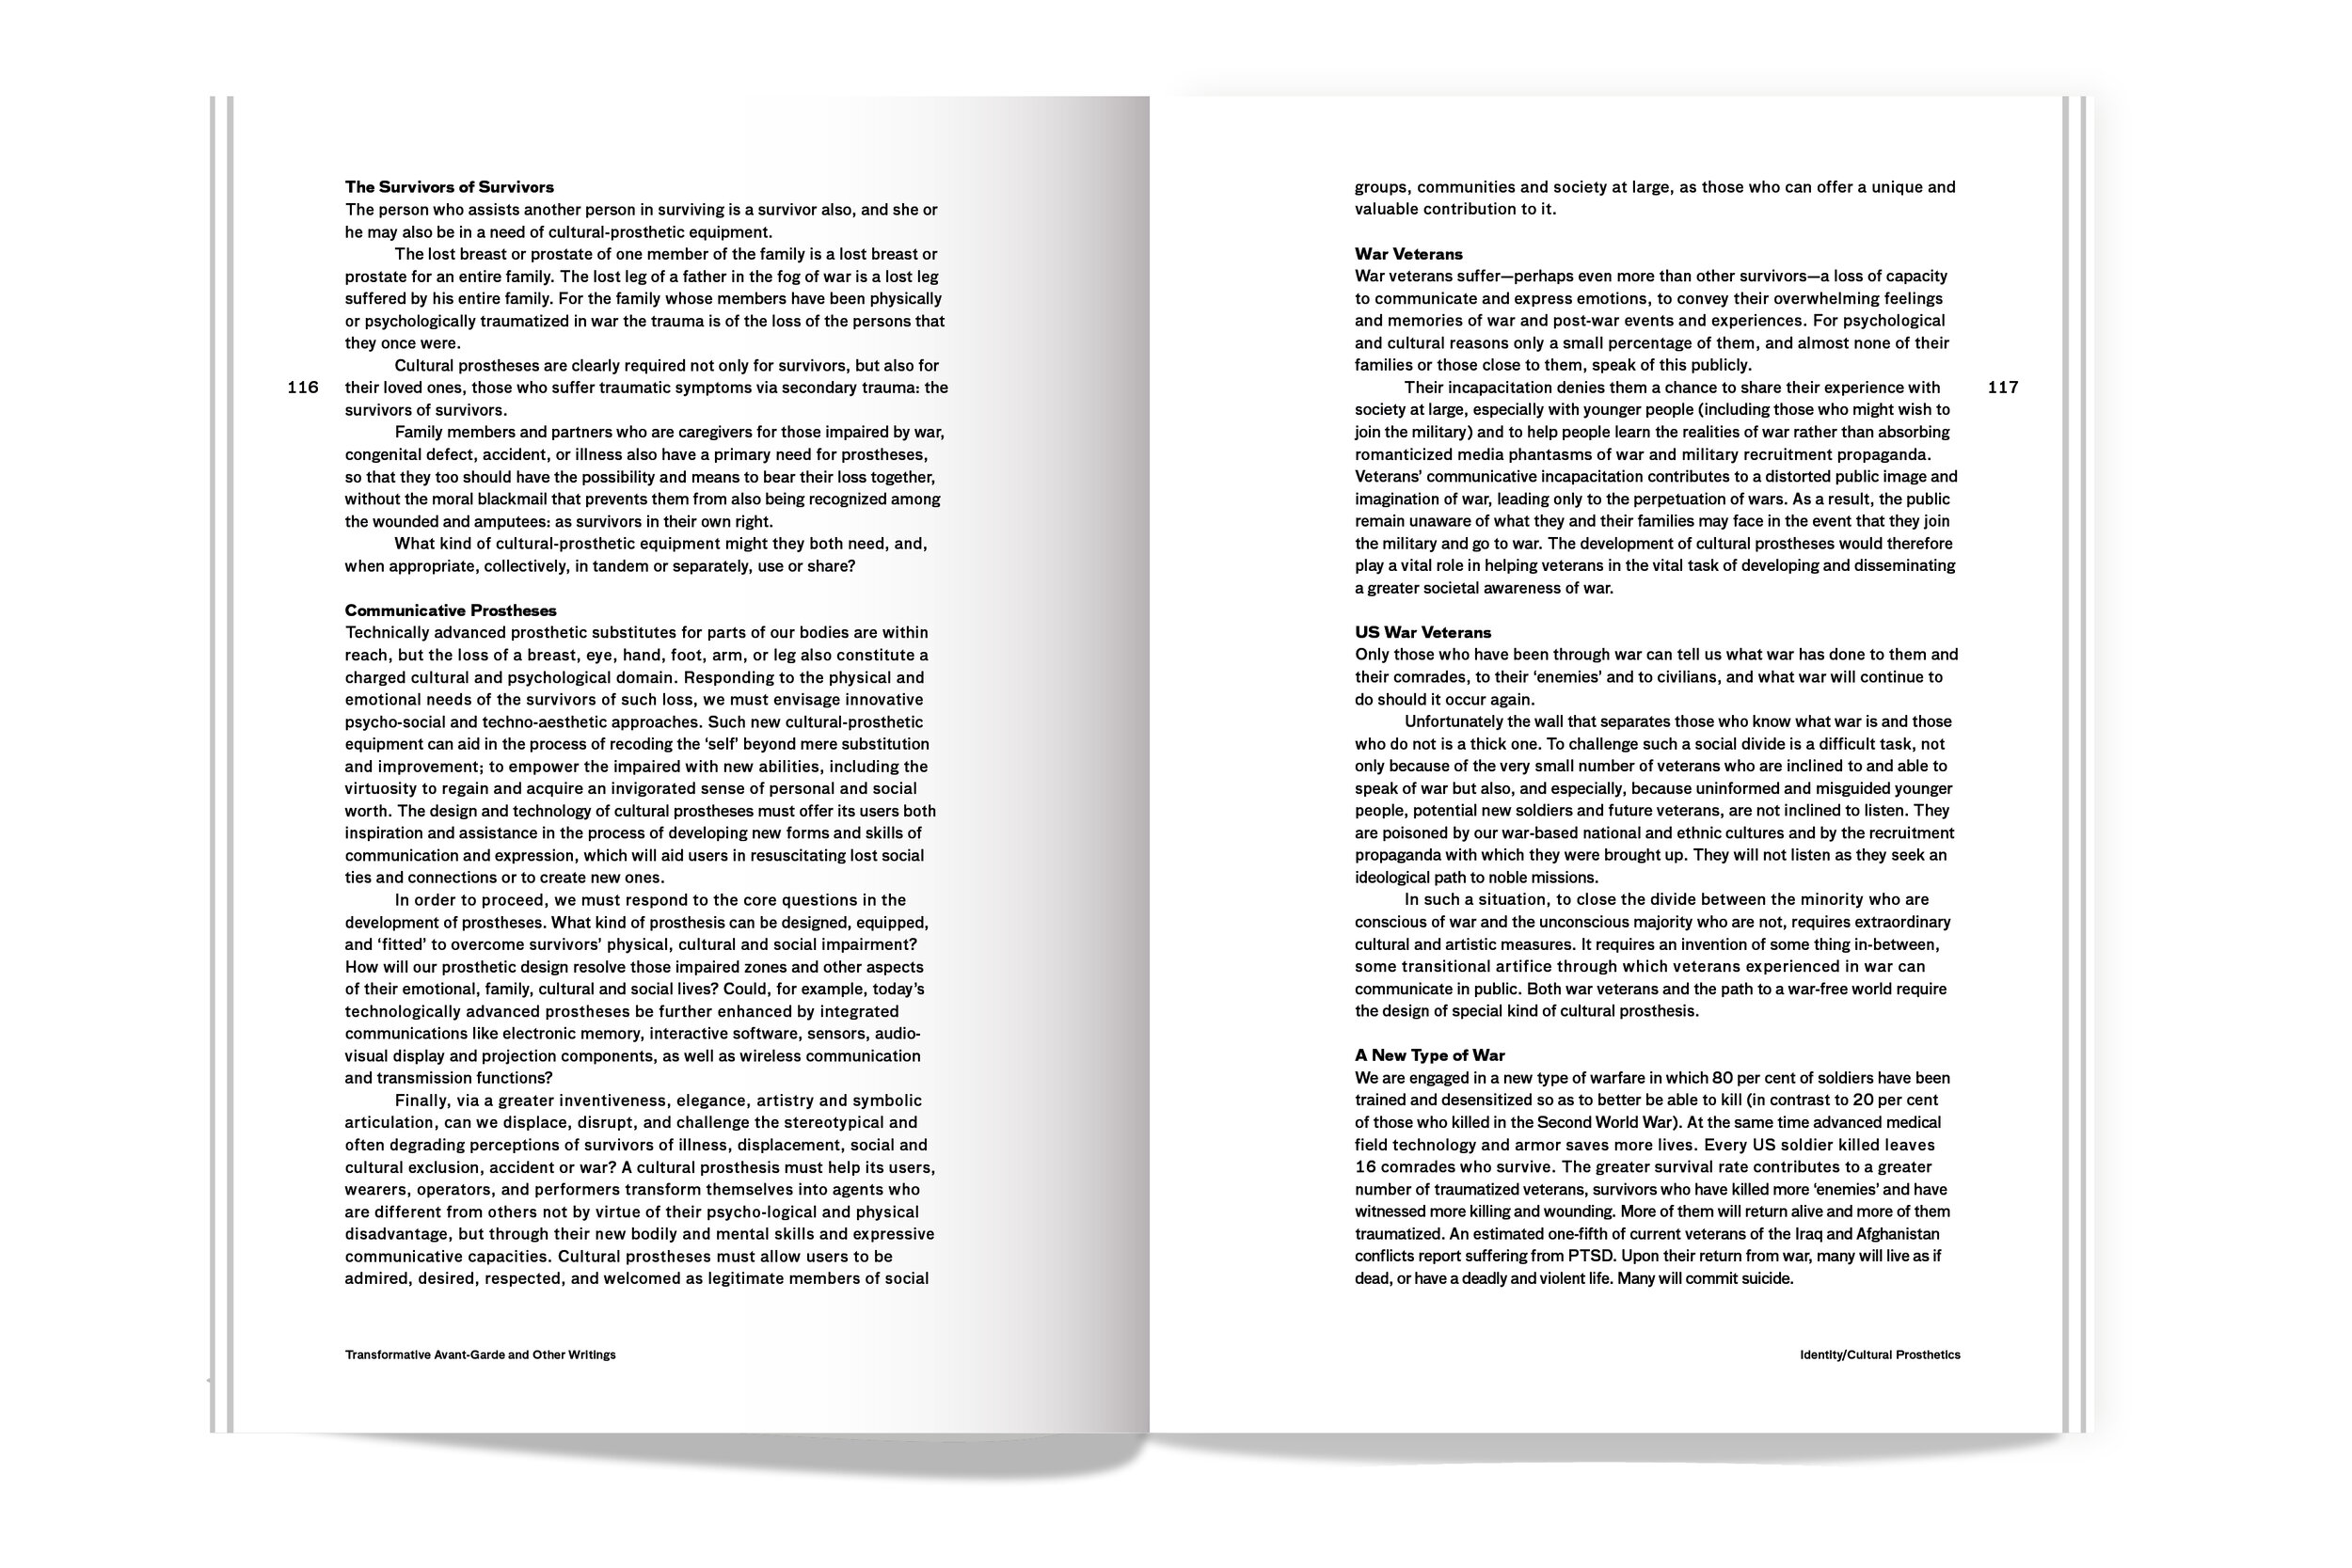 BDP_Transformative Avant-Garde & Other Writings_Inners_V2-004.jpg